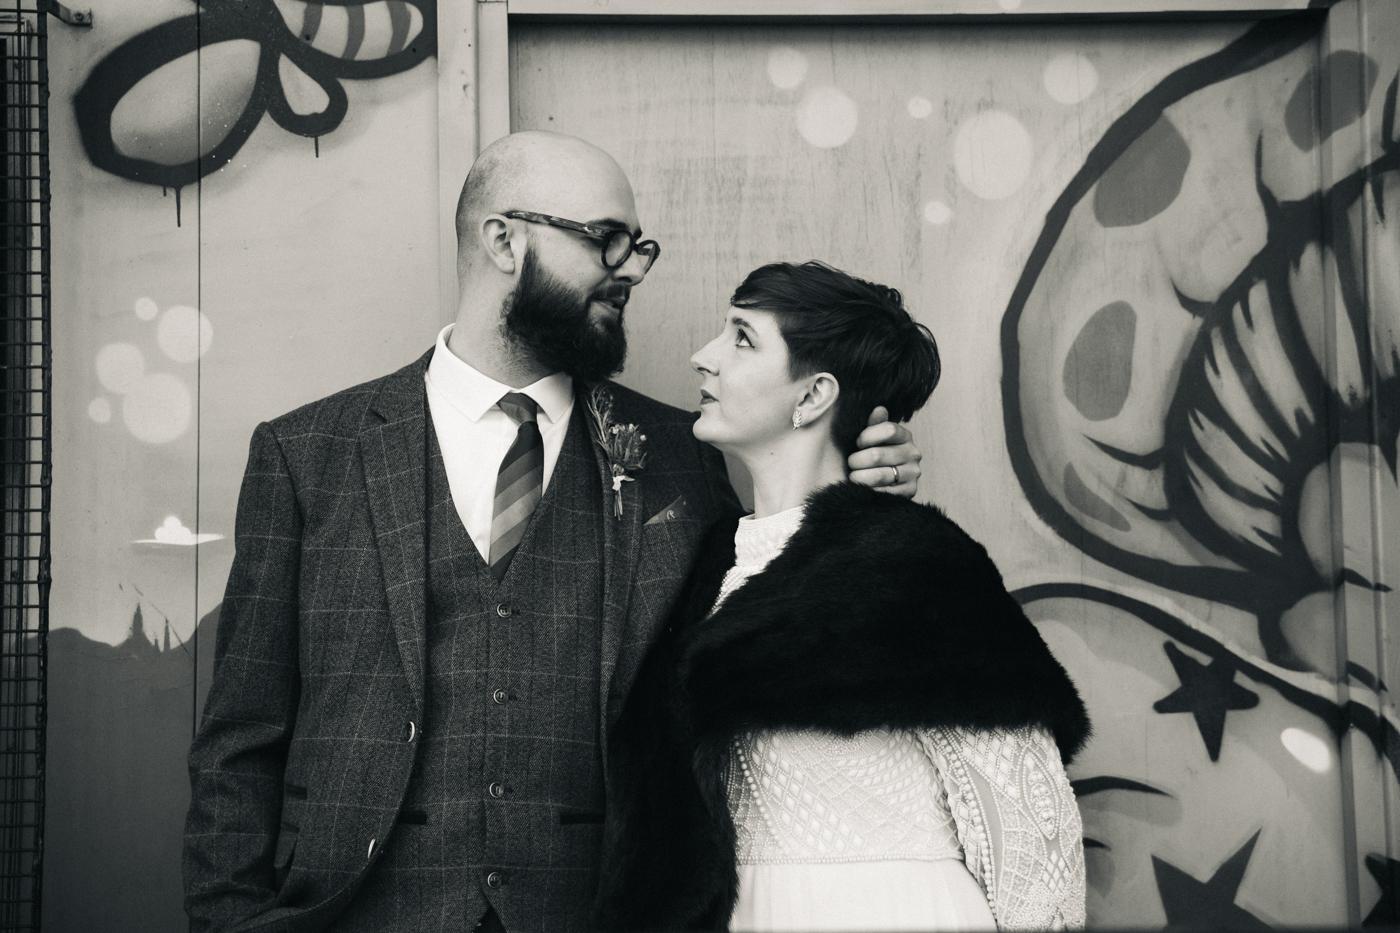 teesside-newcastle-gateshead-wedding-photography-photographer-creative-0068.jpg